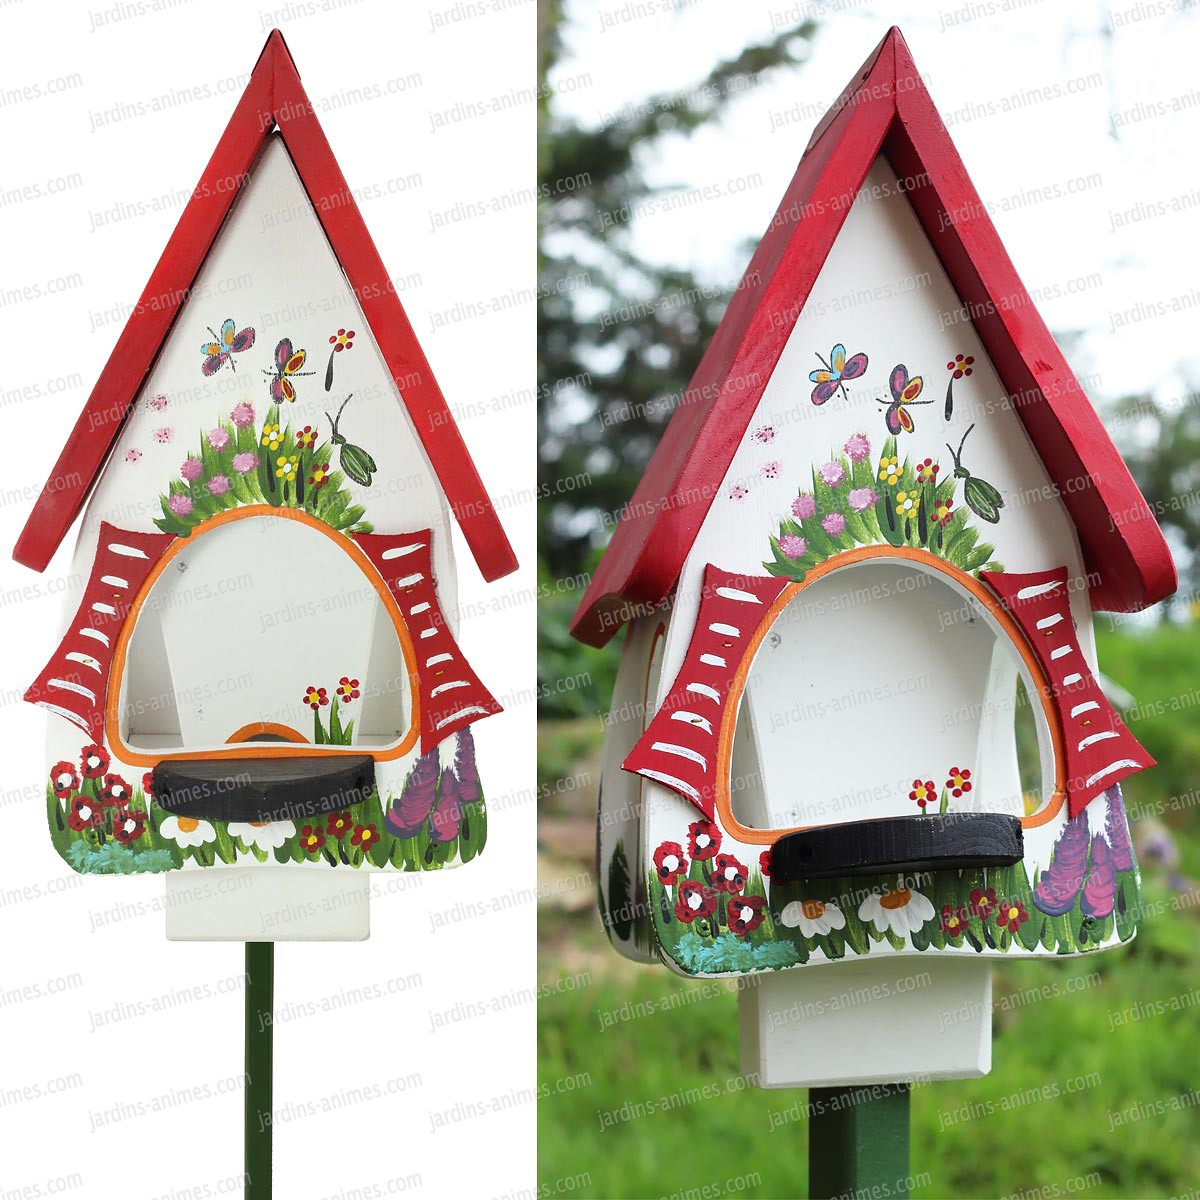 Mangeoire jardin magique blanc mangeoires bains d - Mangeoire a oiseau ...